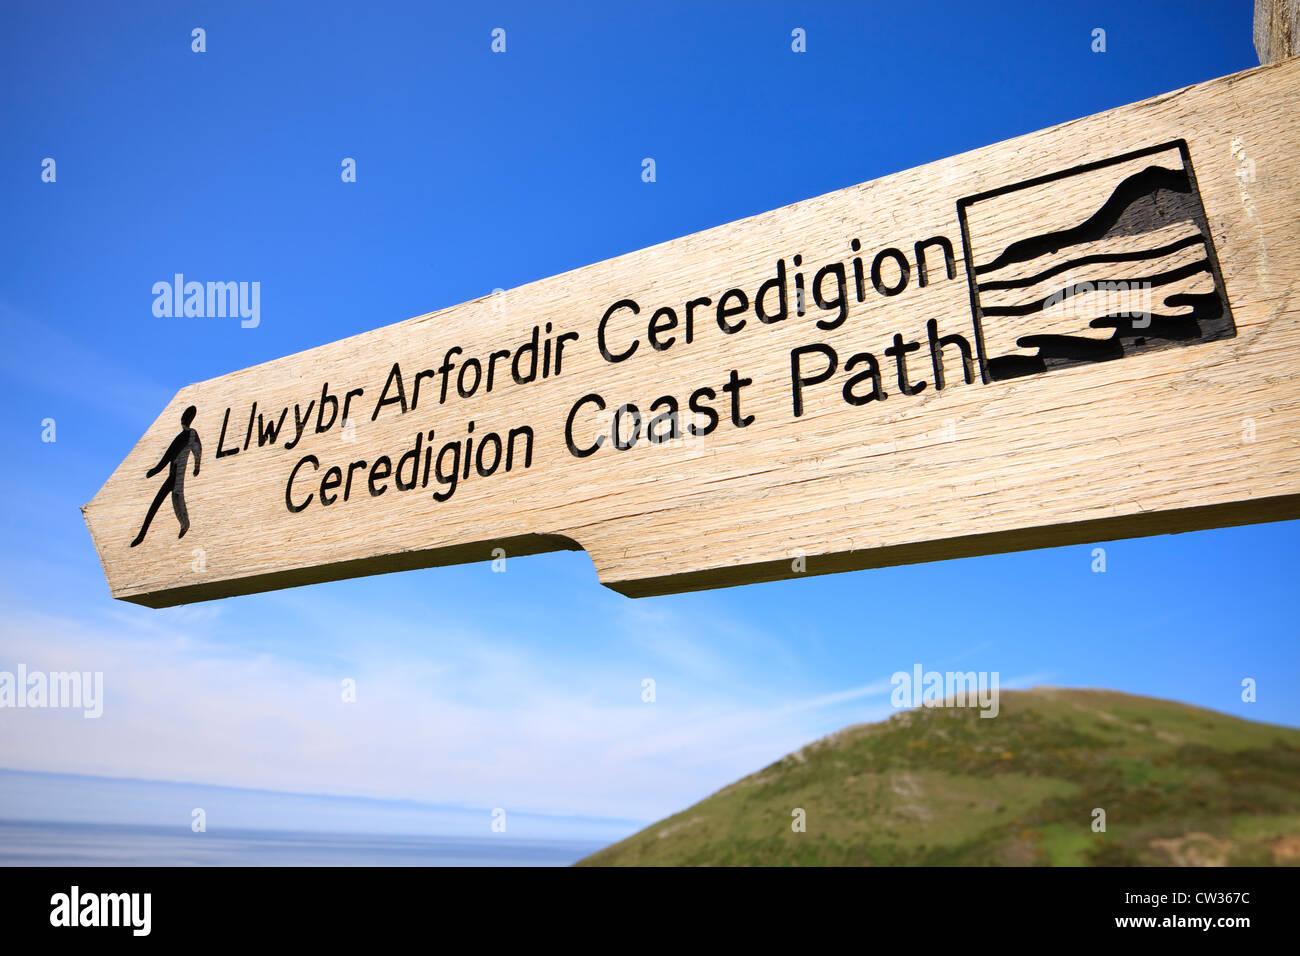 Ceredigion Coast Path - Stock Image